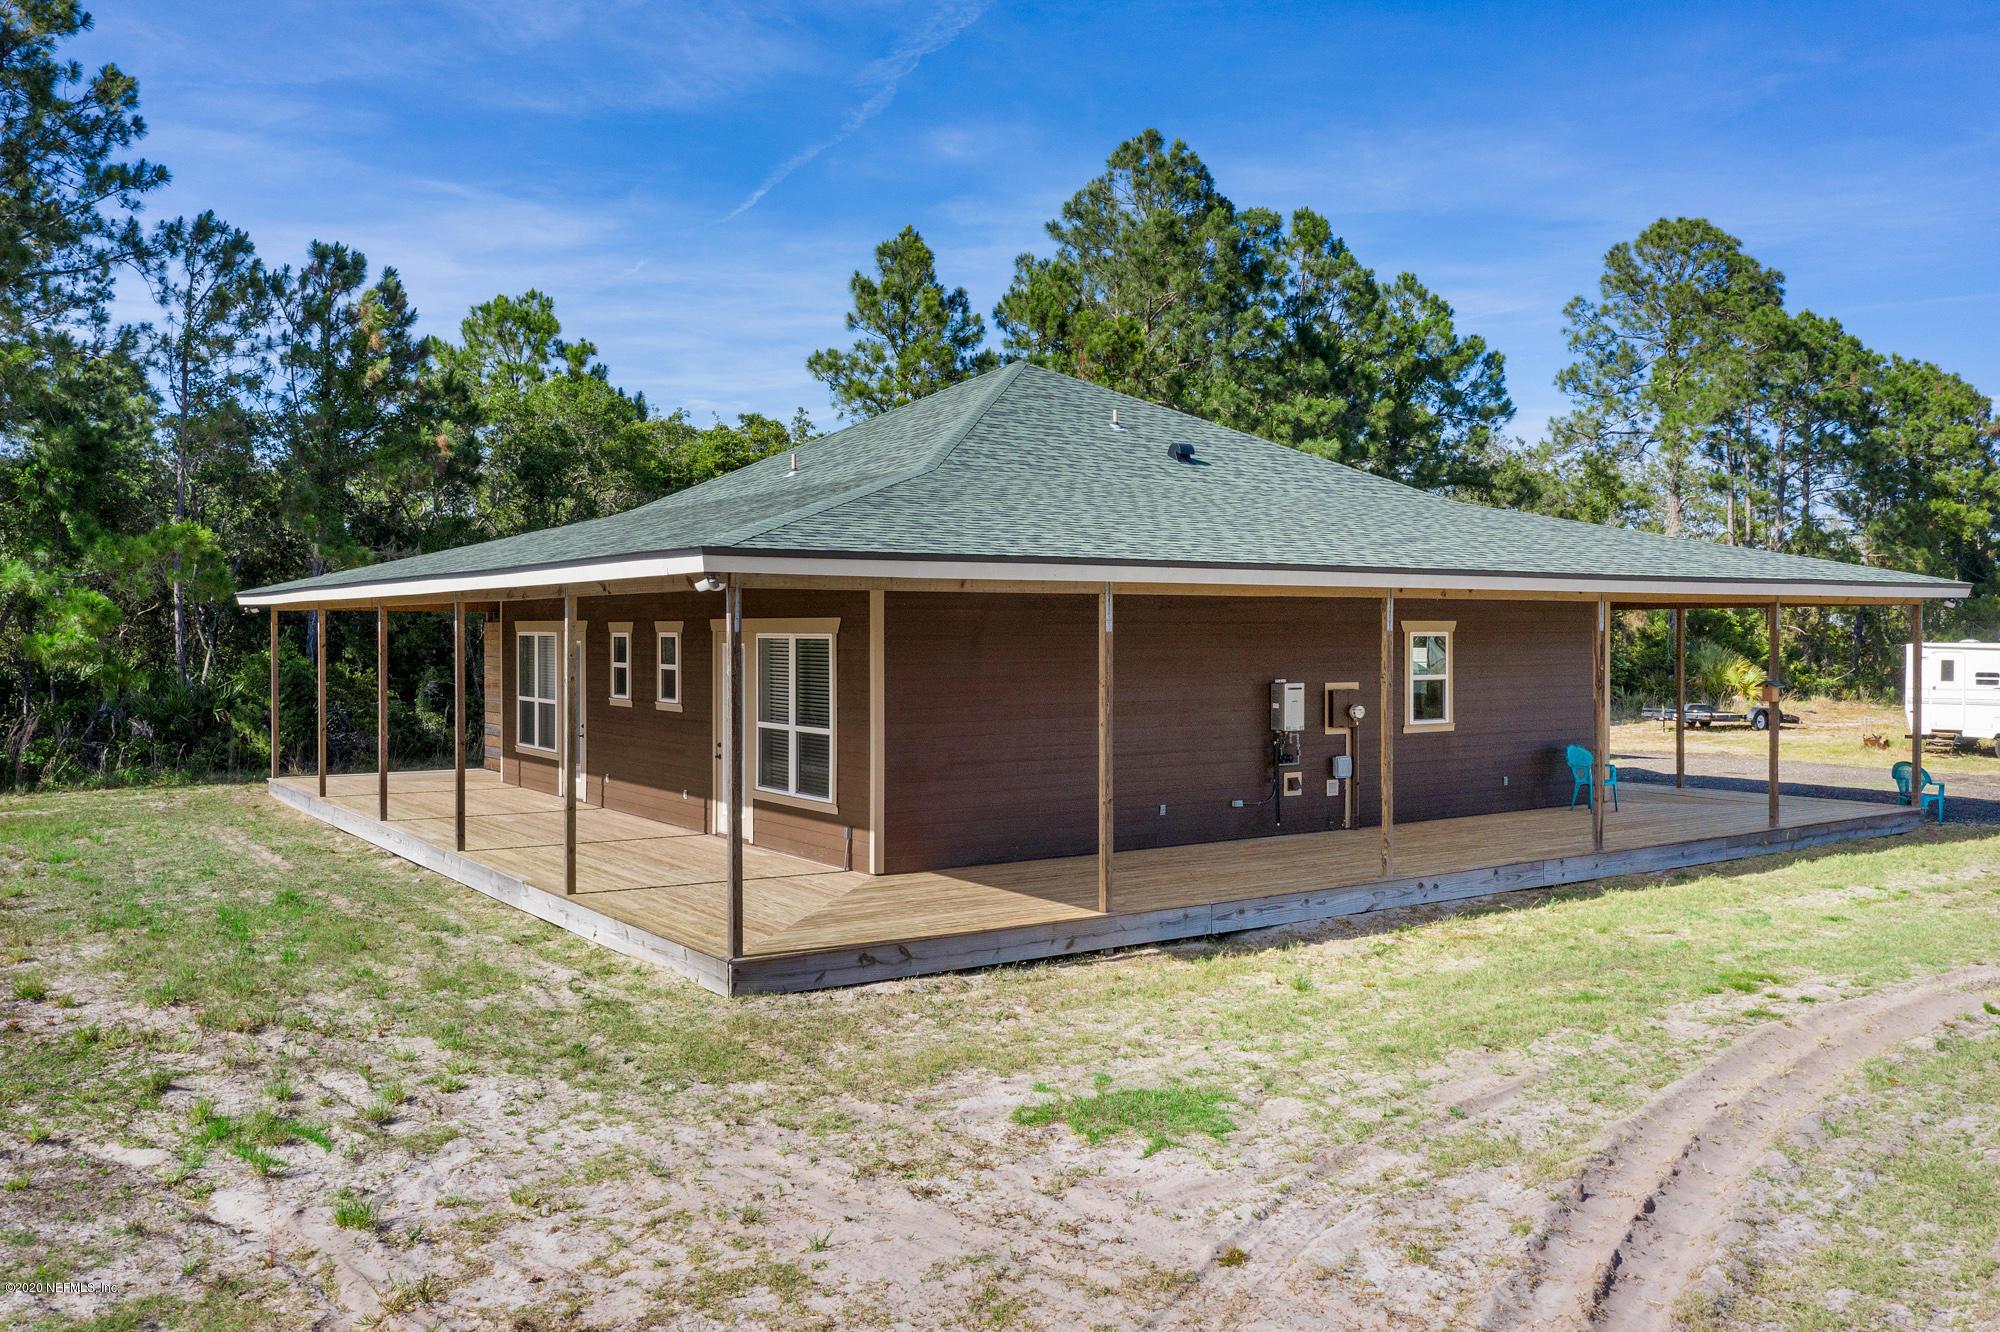 13045 SAWPIT, JACKSONVILLE, FLORIDA 32226, 2 Bedrooms Bedrooms, ,2 BathroomsBathrooms,Residential,For sale,SAWPIT,1054893